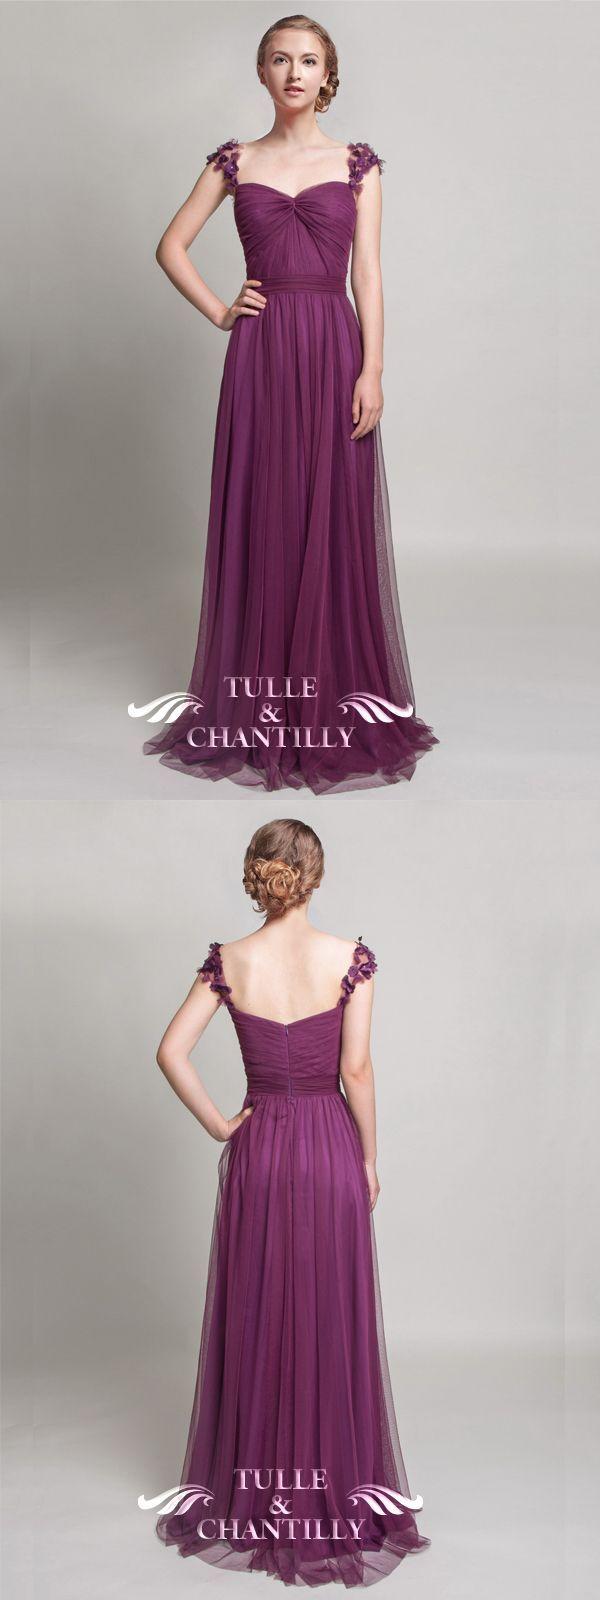 Elegant Long Bridesmaid Dress with Floral Straps TBQP327